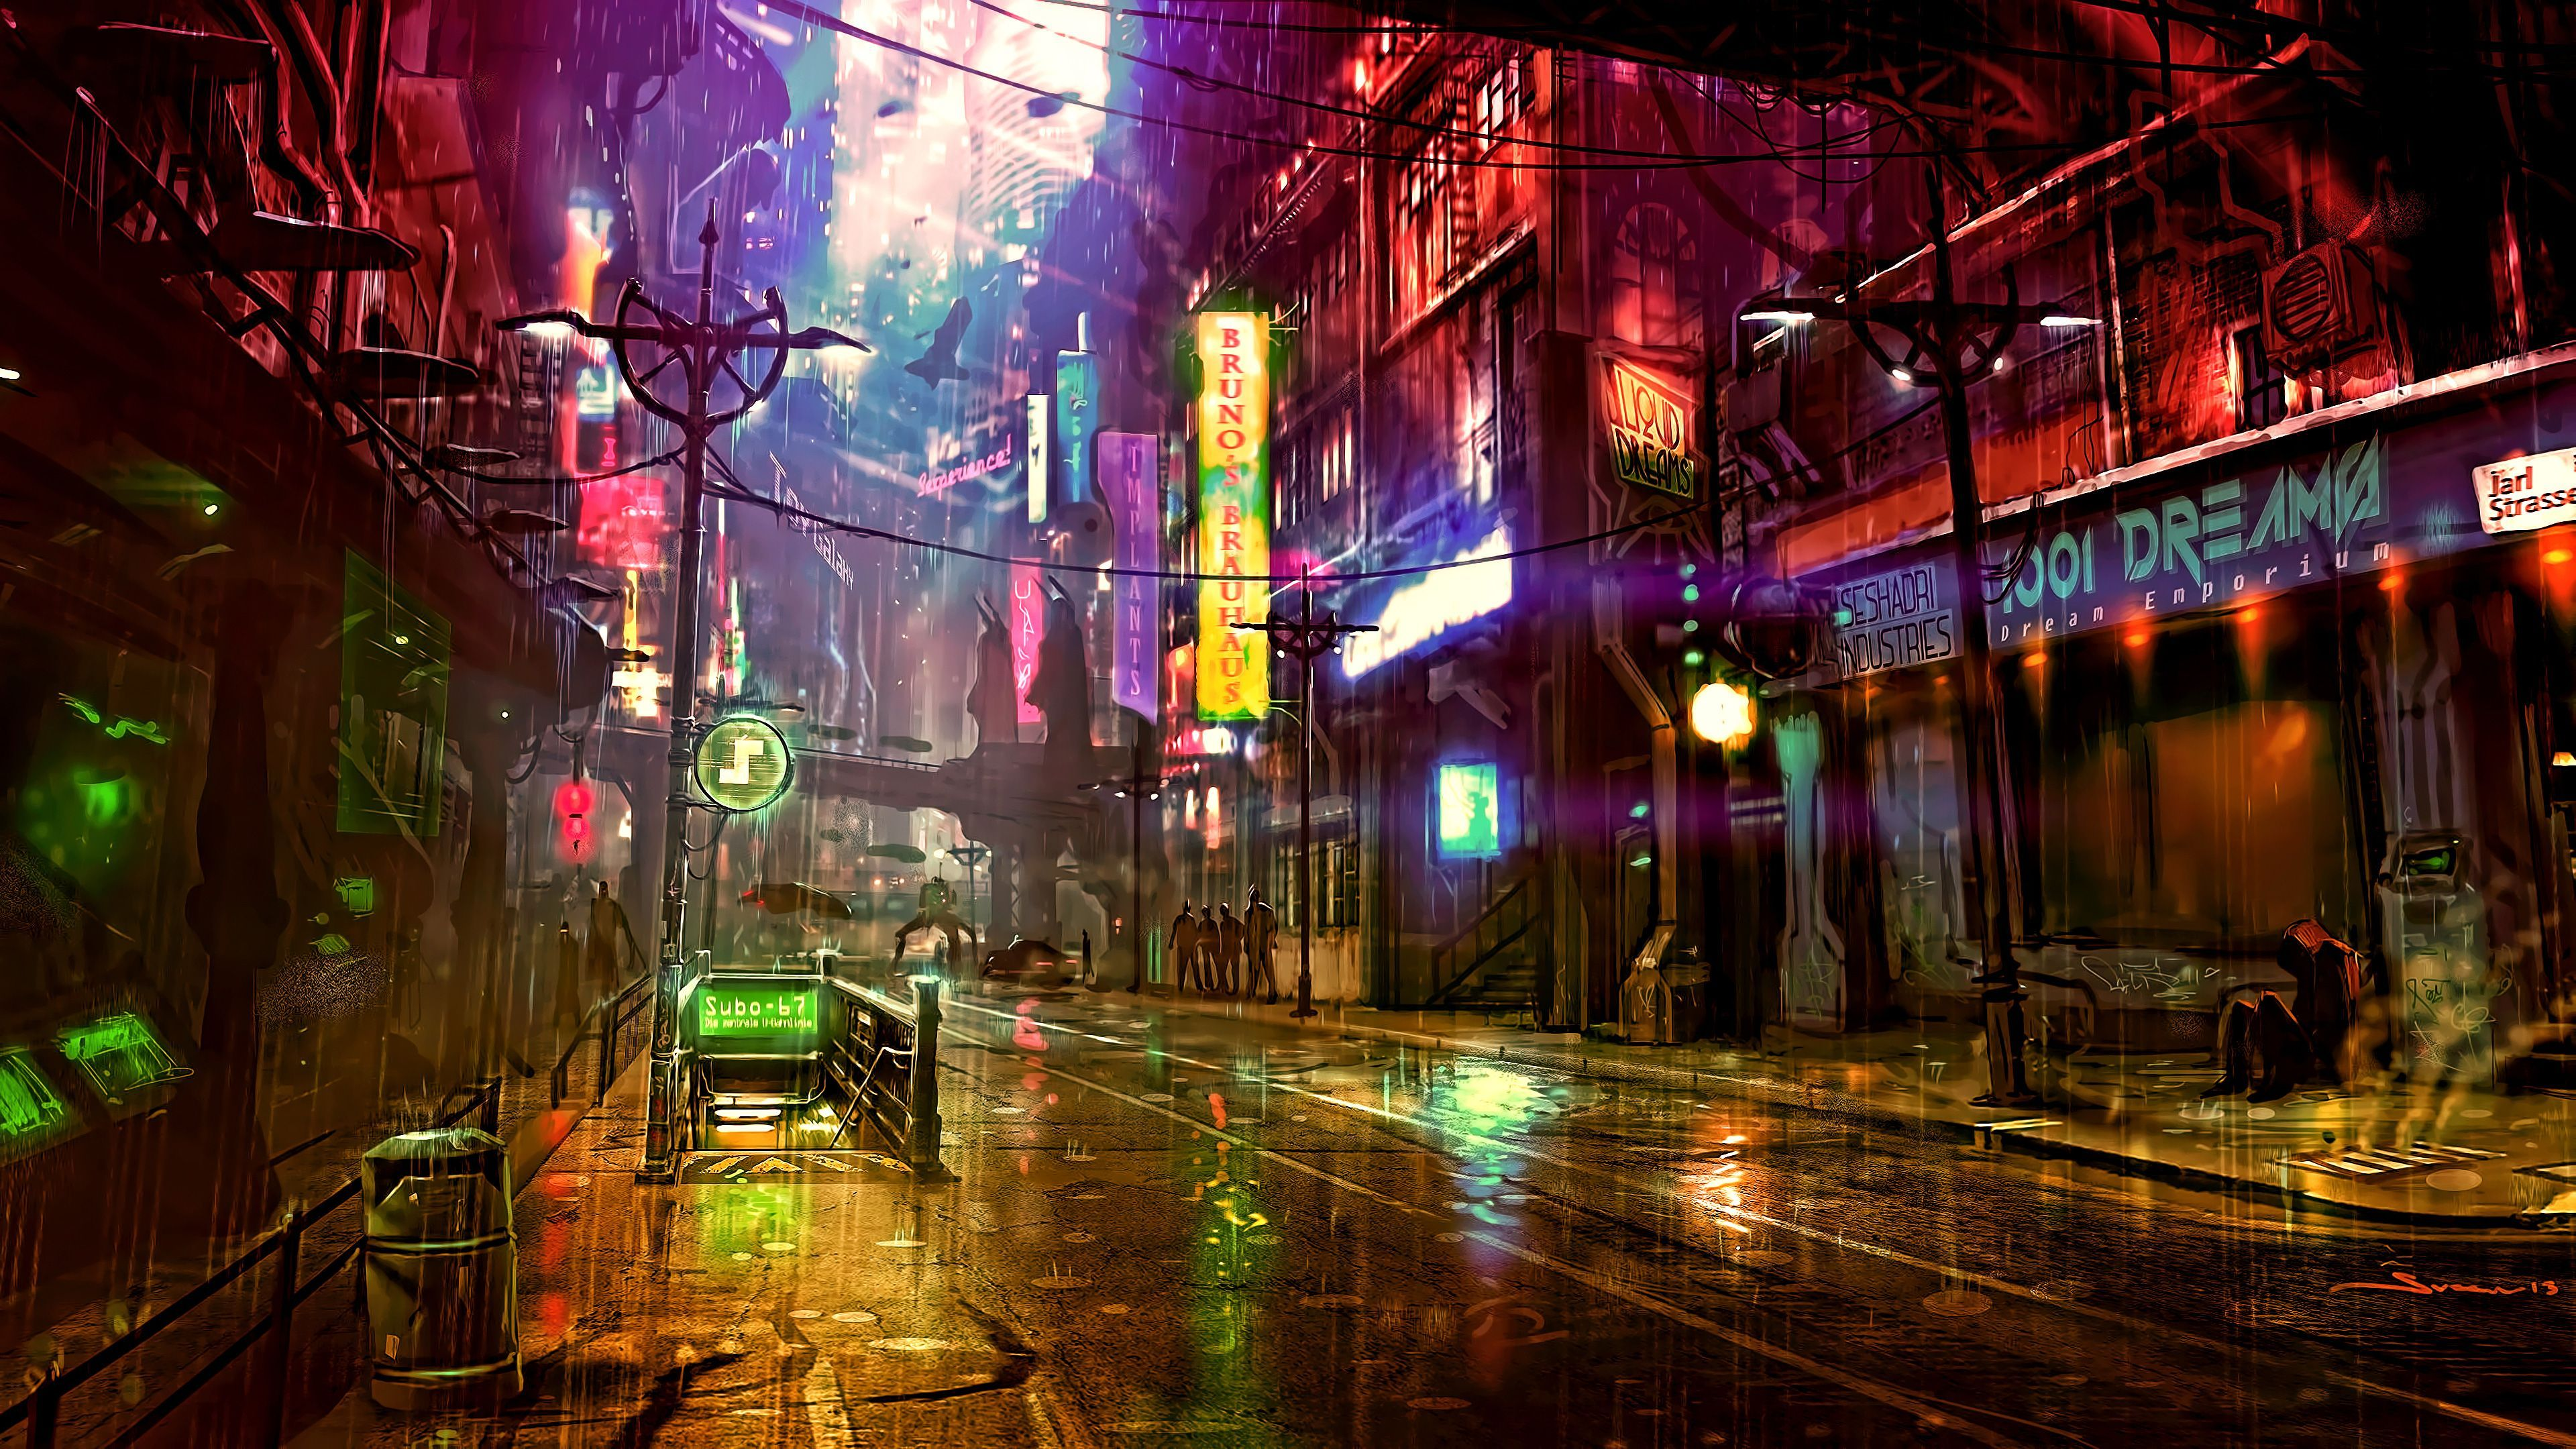 Cyberpunk Tokyo 4K Wallpapers - Top Free Cyberpunk Tokyo ...